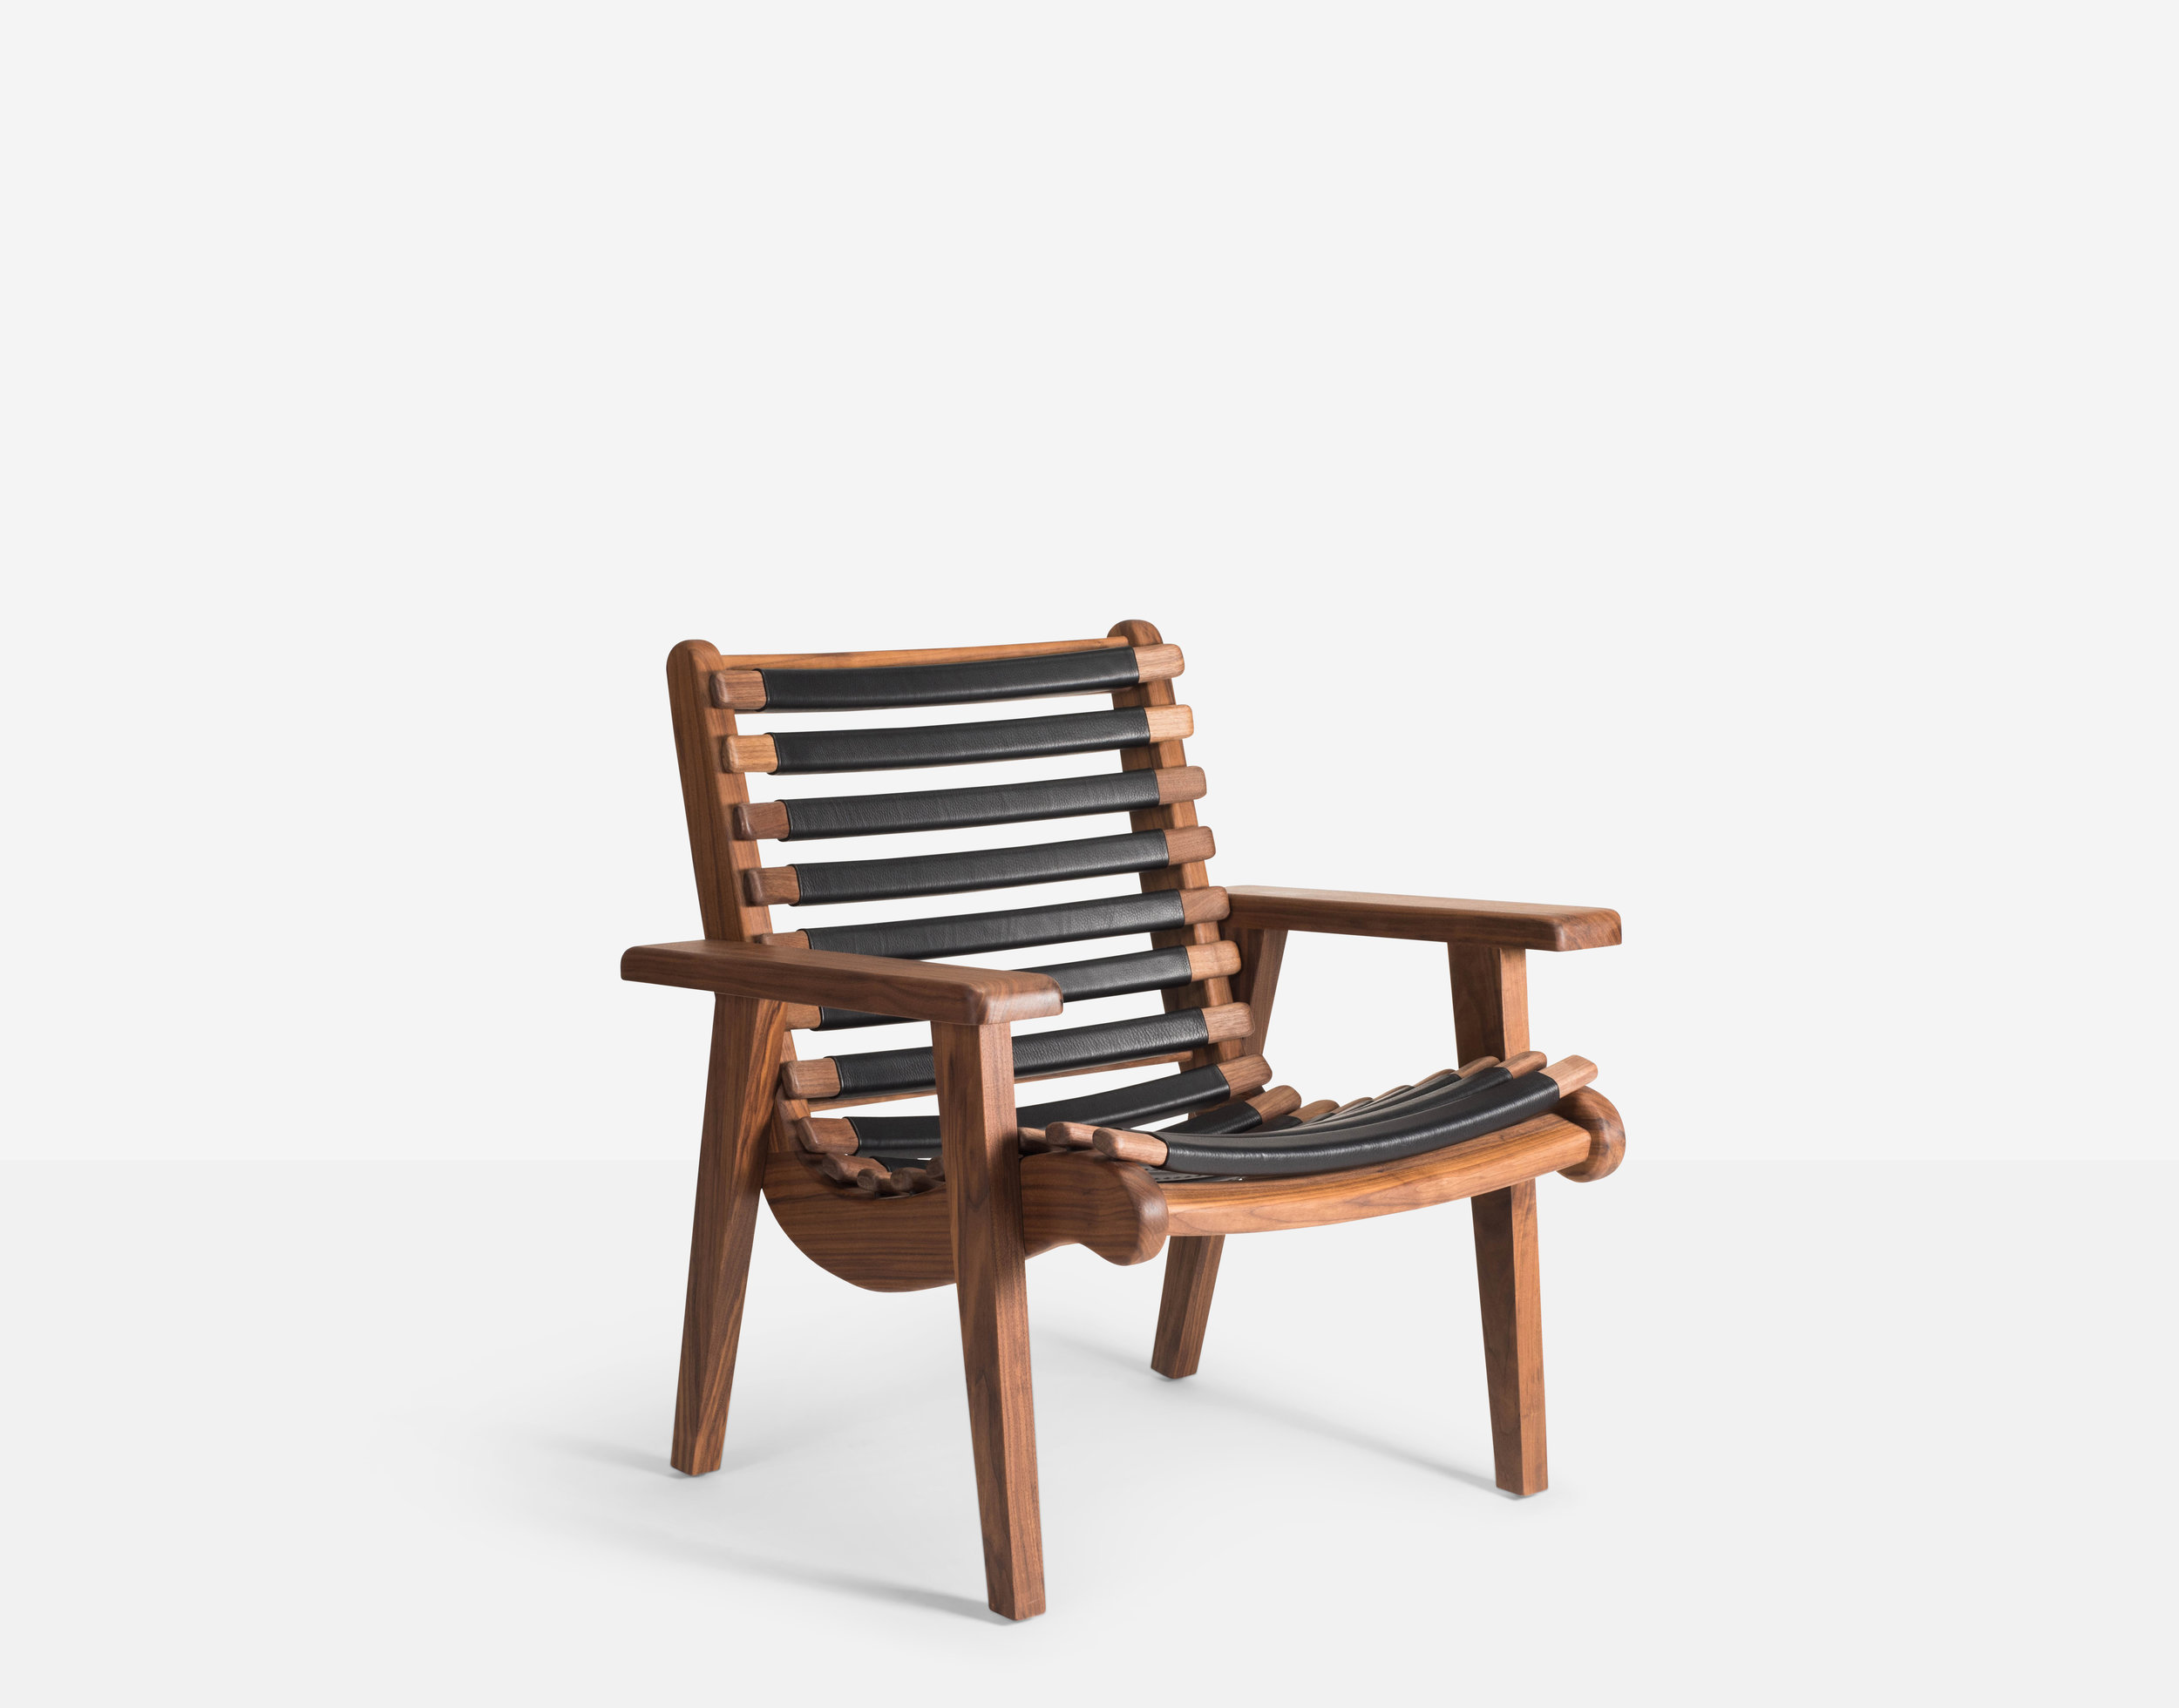 Luteca_MvB_San Miguelito-Armchair_Black-Leather_Walnut_FP-W.jpg